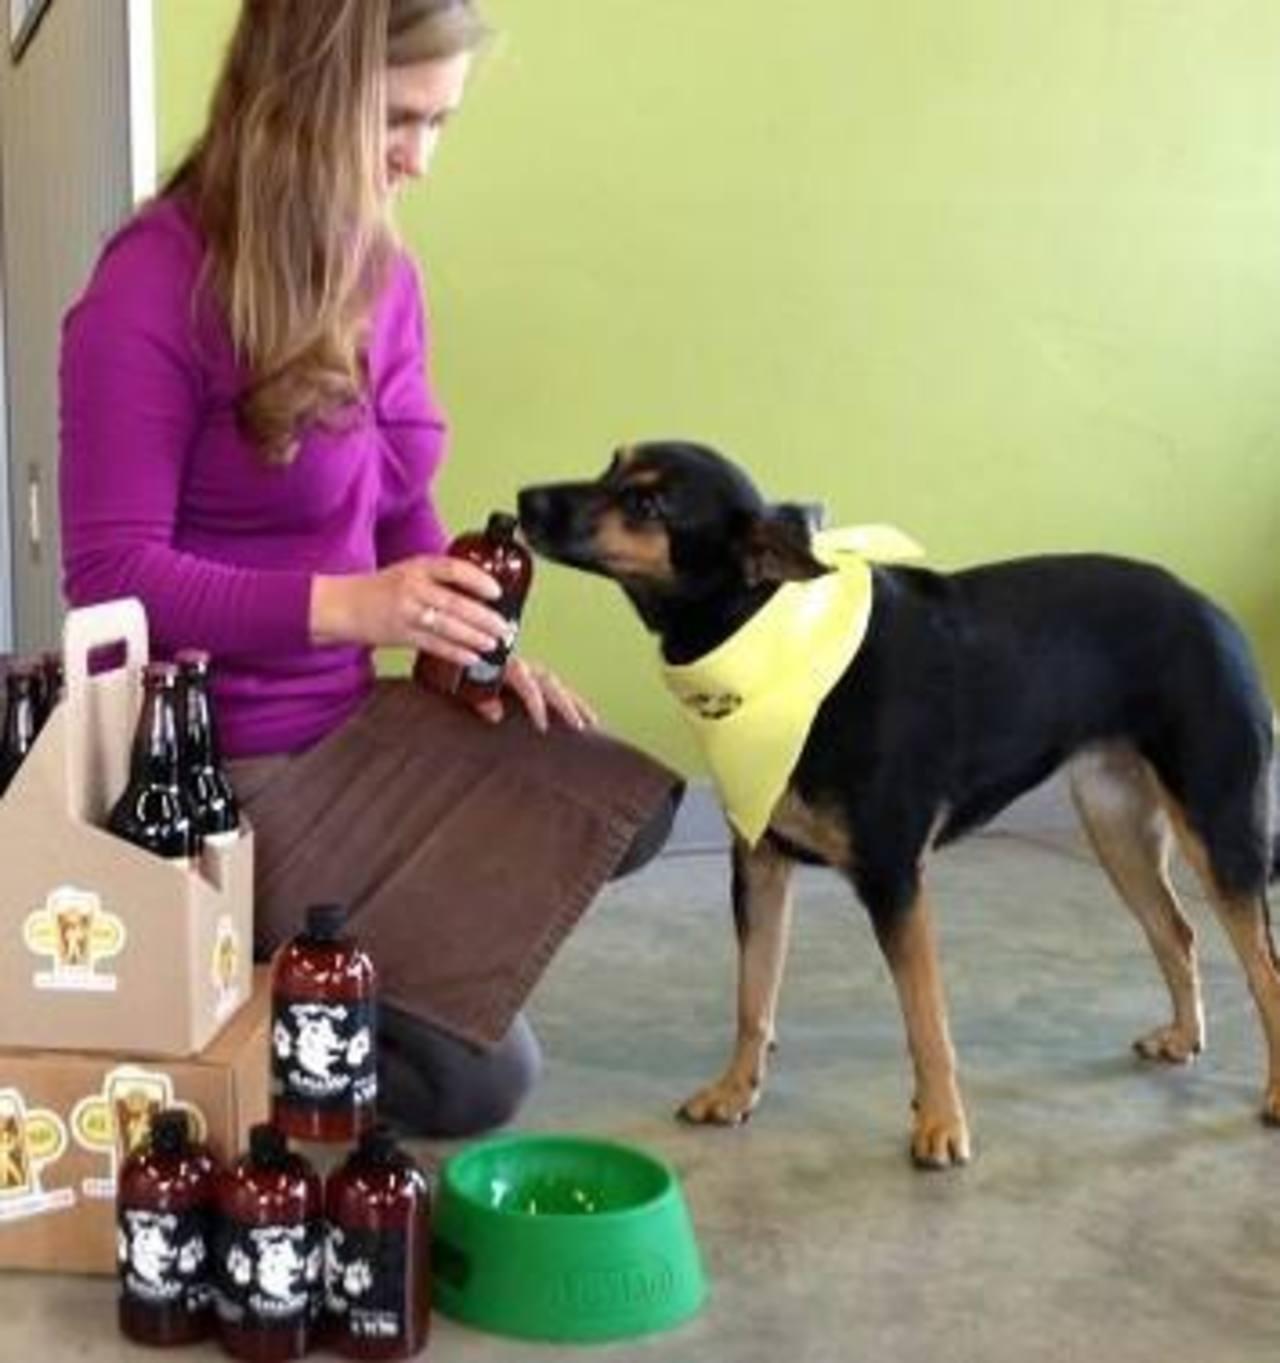 Dawg Grog, la cerveza artesanal para perros